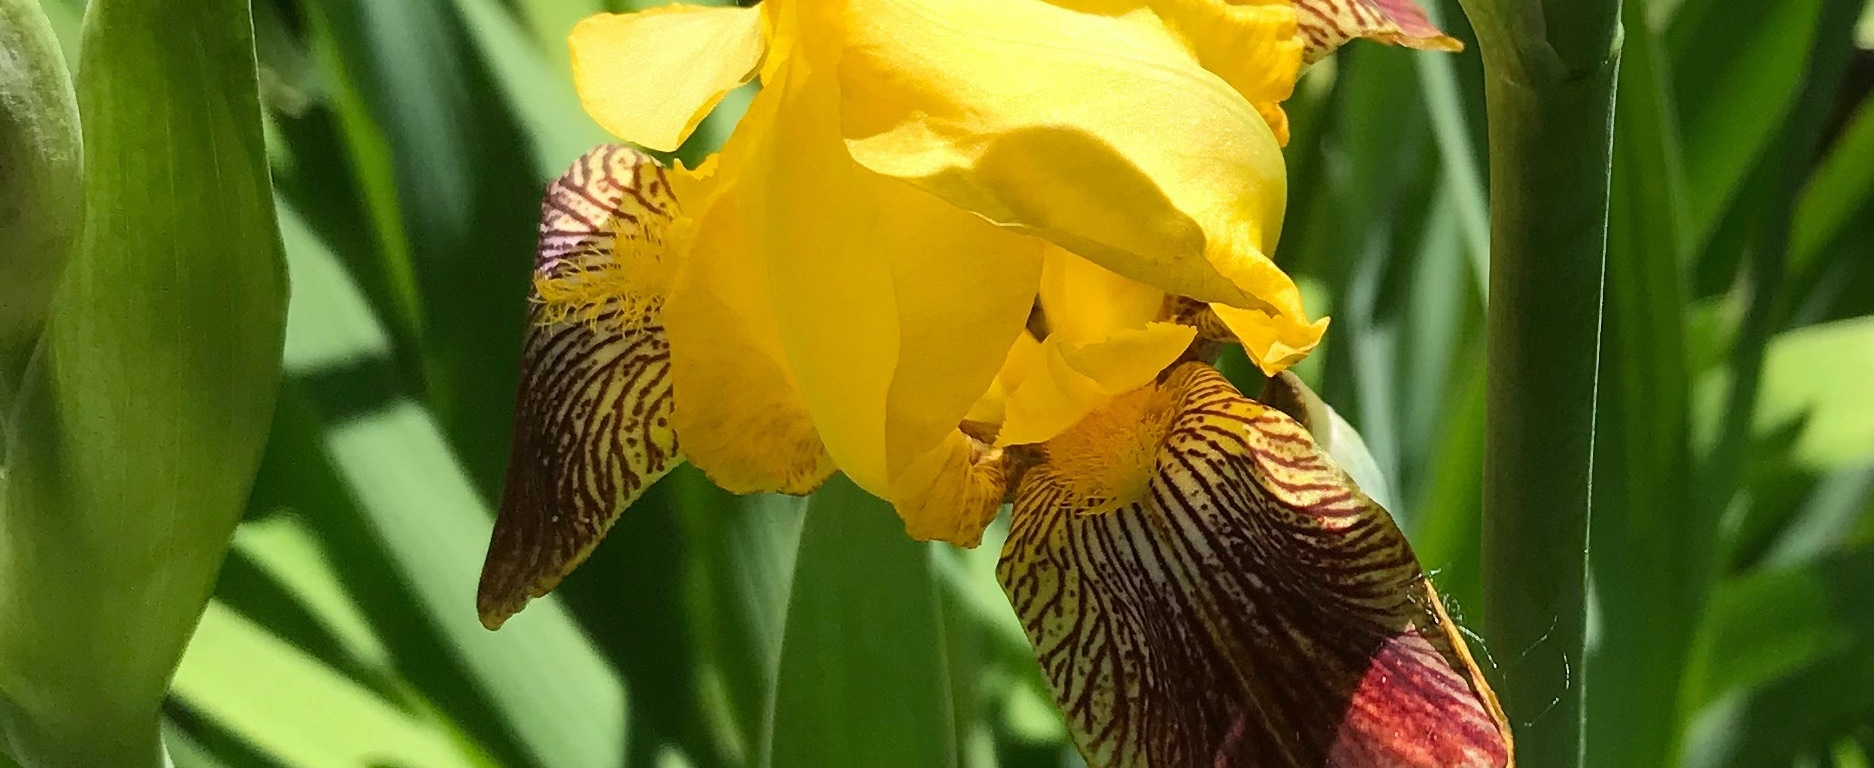 Yellow iris with maroon highilghts.